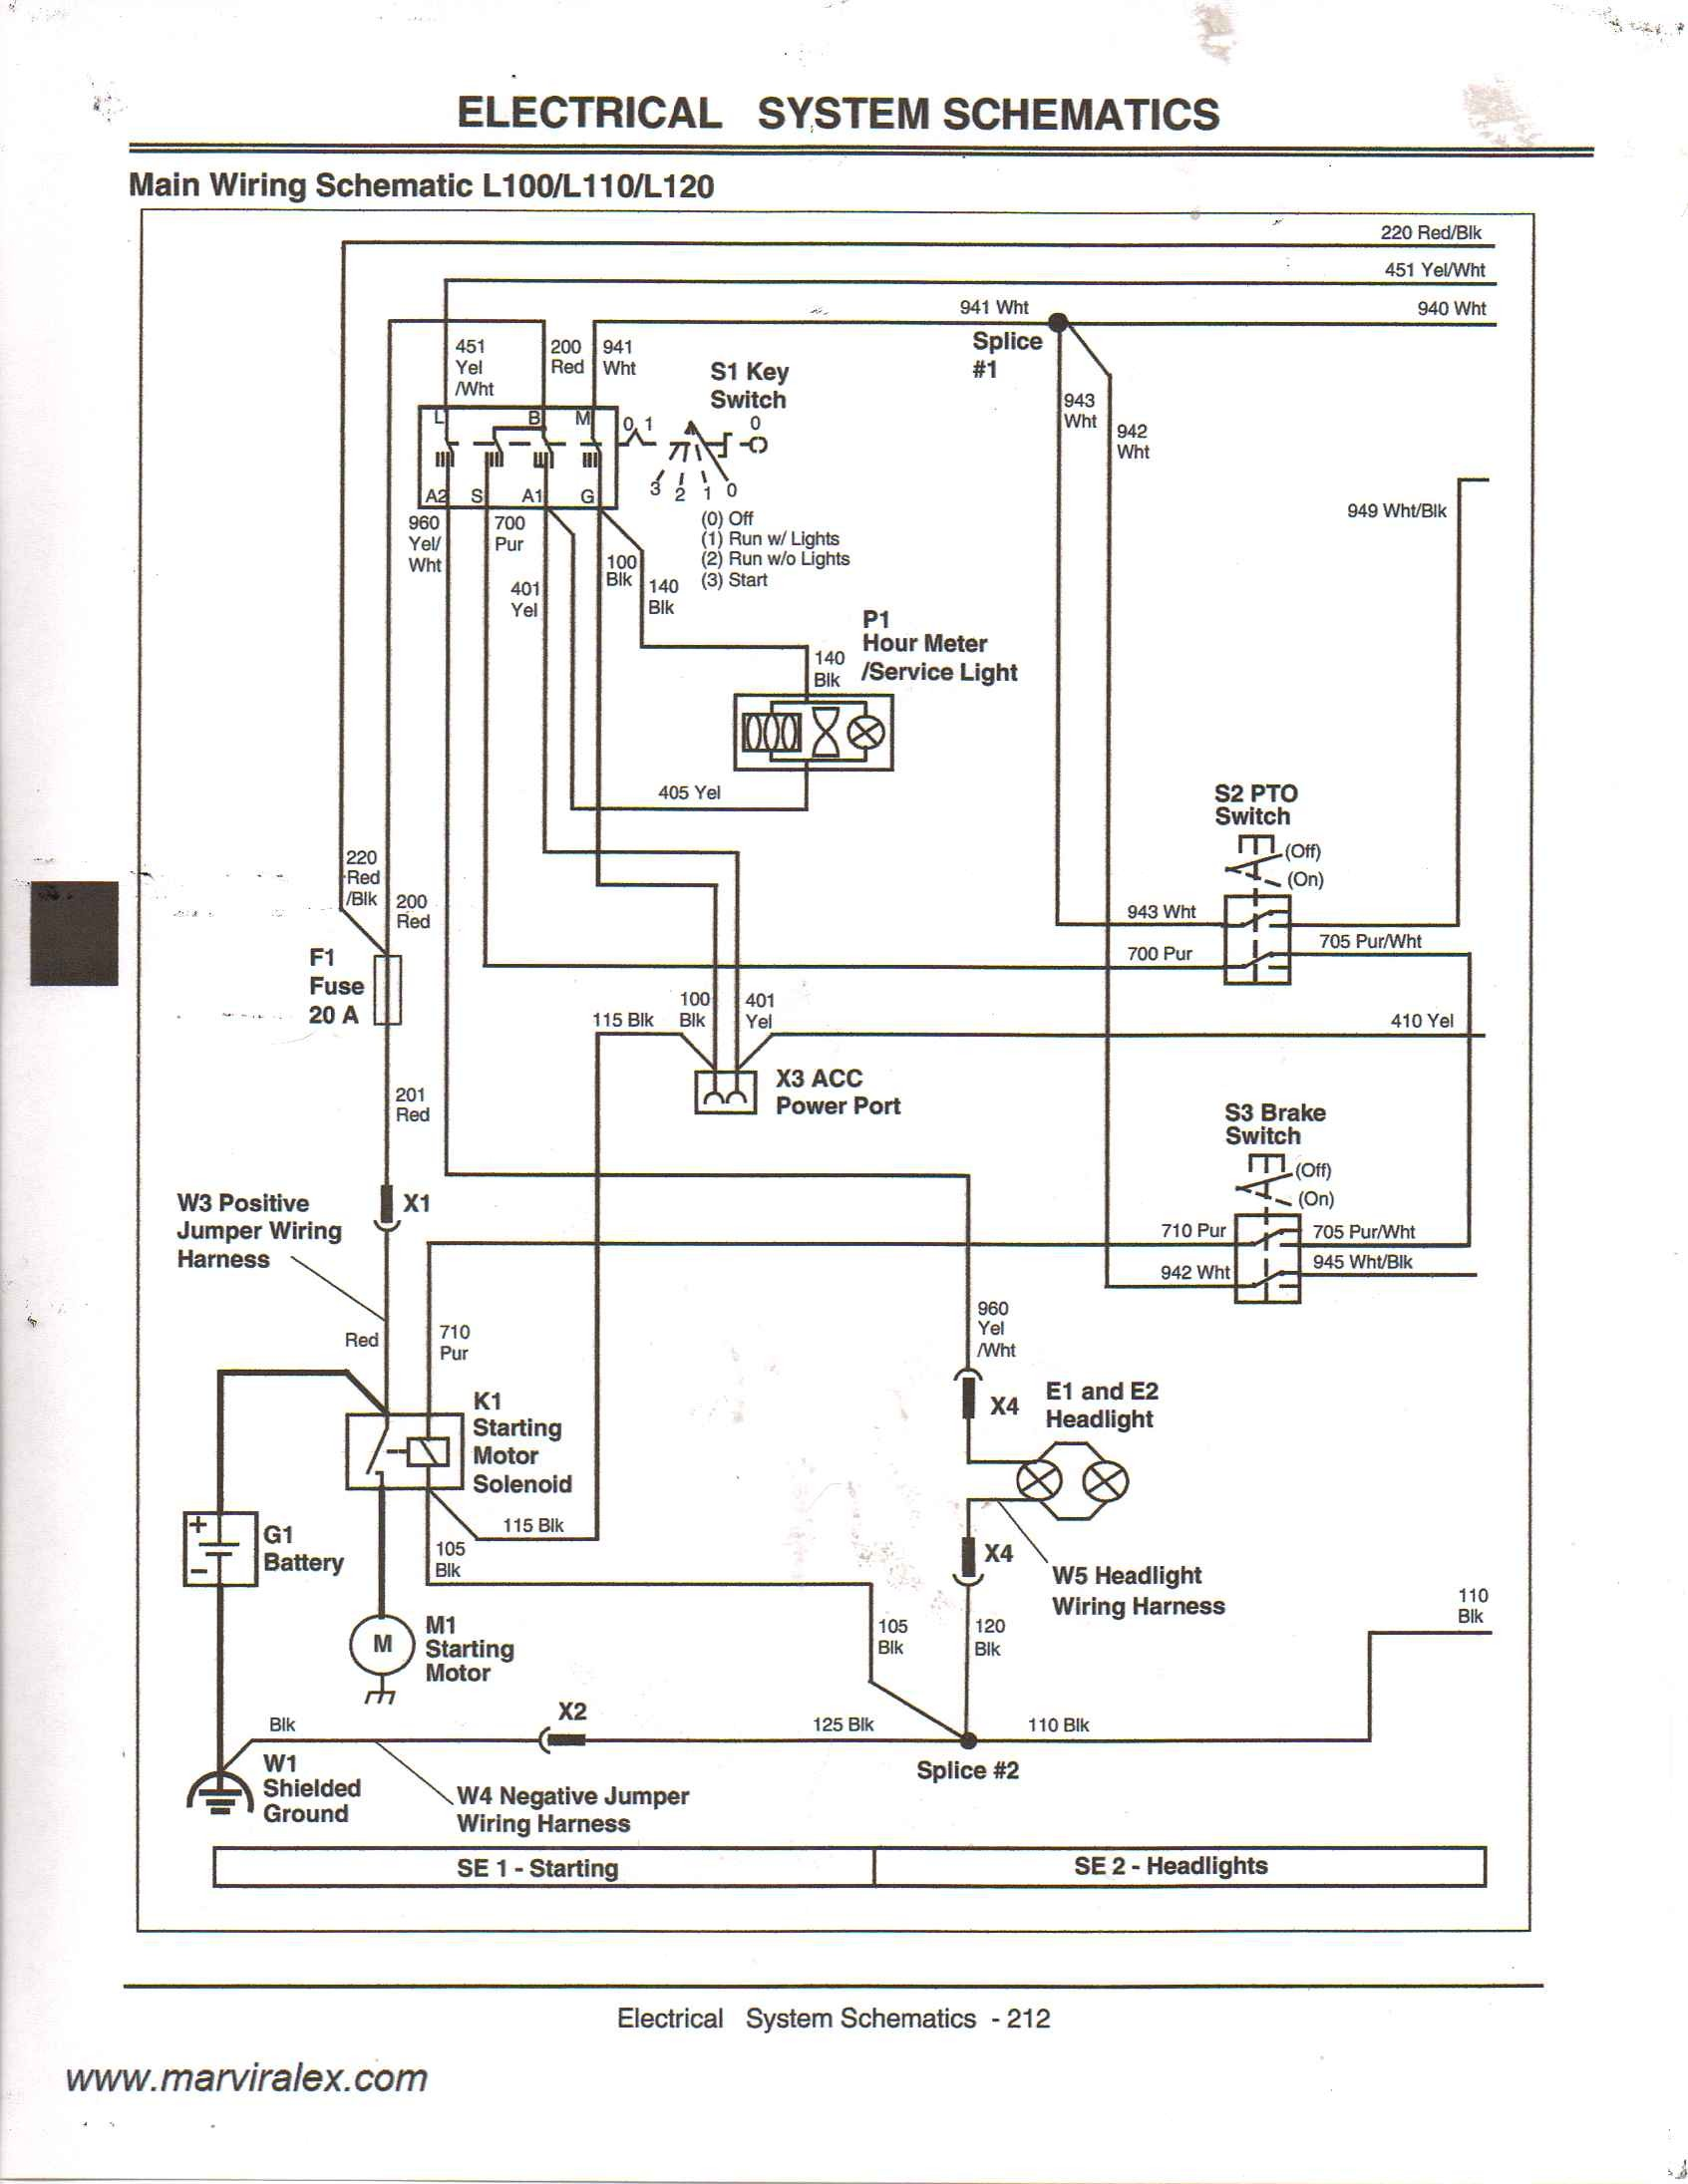 John Deere 345 Wiering Diagram Ww 1570] for John Deere 1050 Tractor Wiring Diagram Free Diagram Of John Deere 345 Wiering Diagram